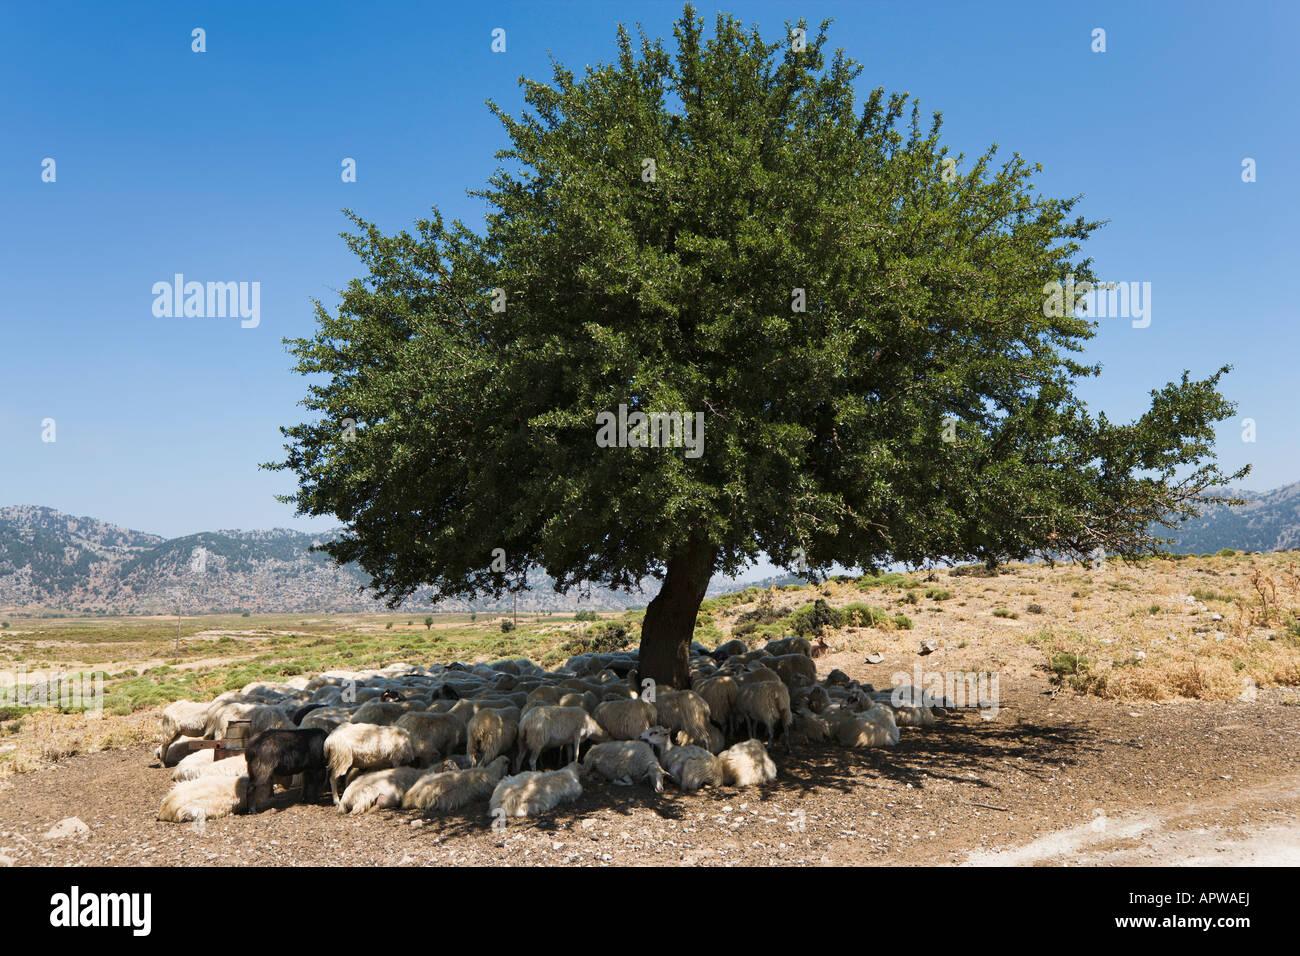 Sheep sheltering under a tree, Omalos Plain, Lefka Ori, Chania Province, Crete, Greece - Stock Image